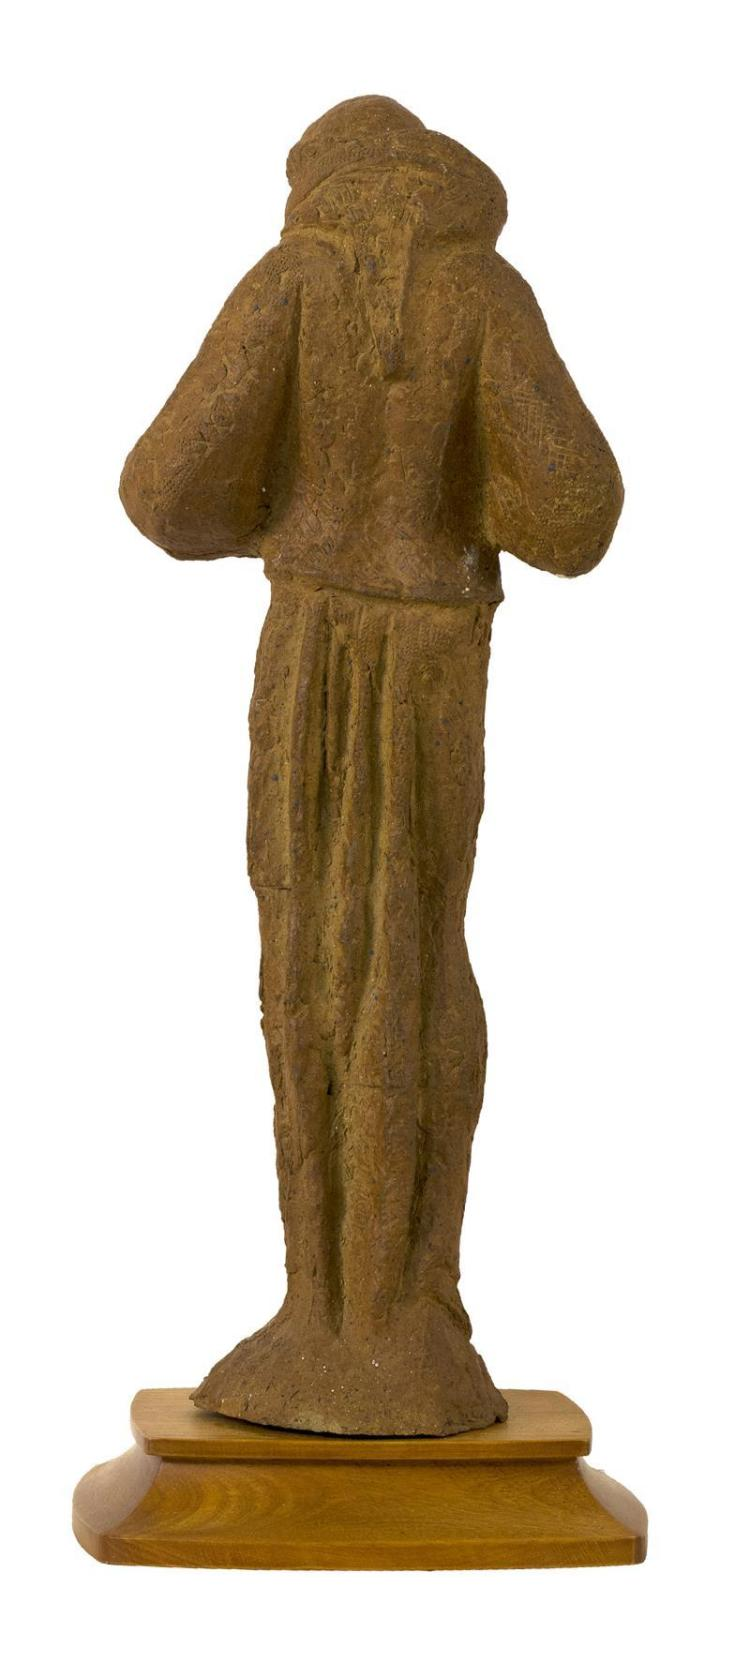 ARNOLD GEISSBUHLER, Massachusetts, 1897-1993, Saint Francis holding a bird., Red clay sculpture, height 24.75